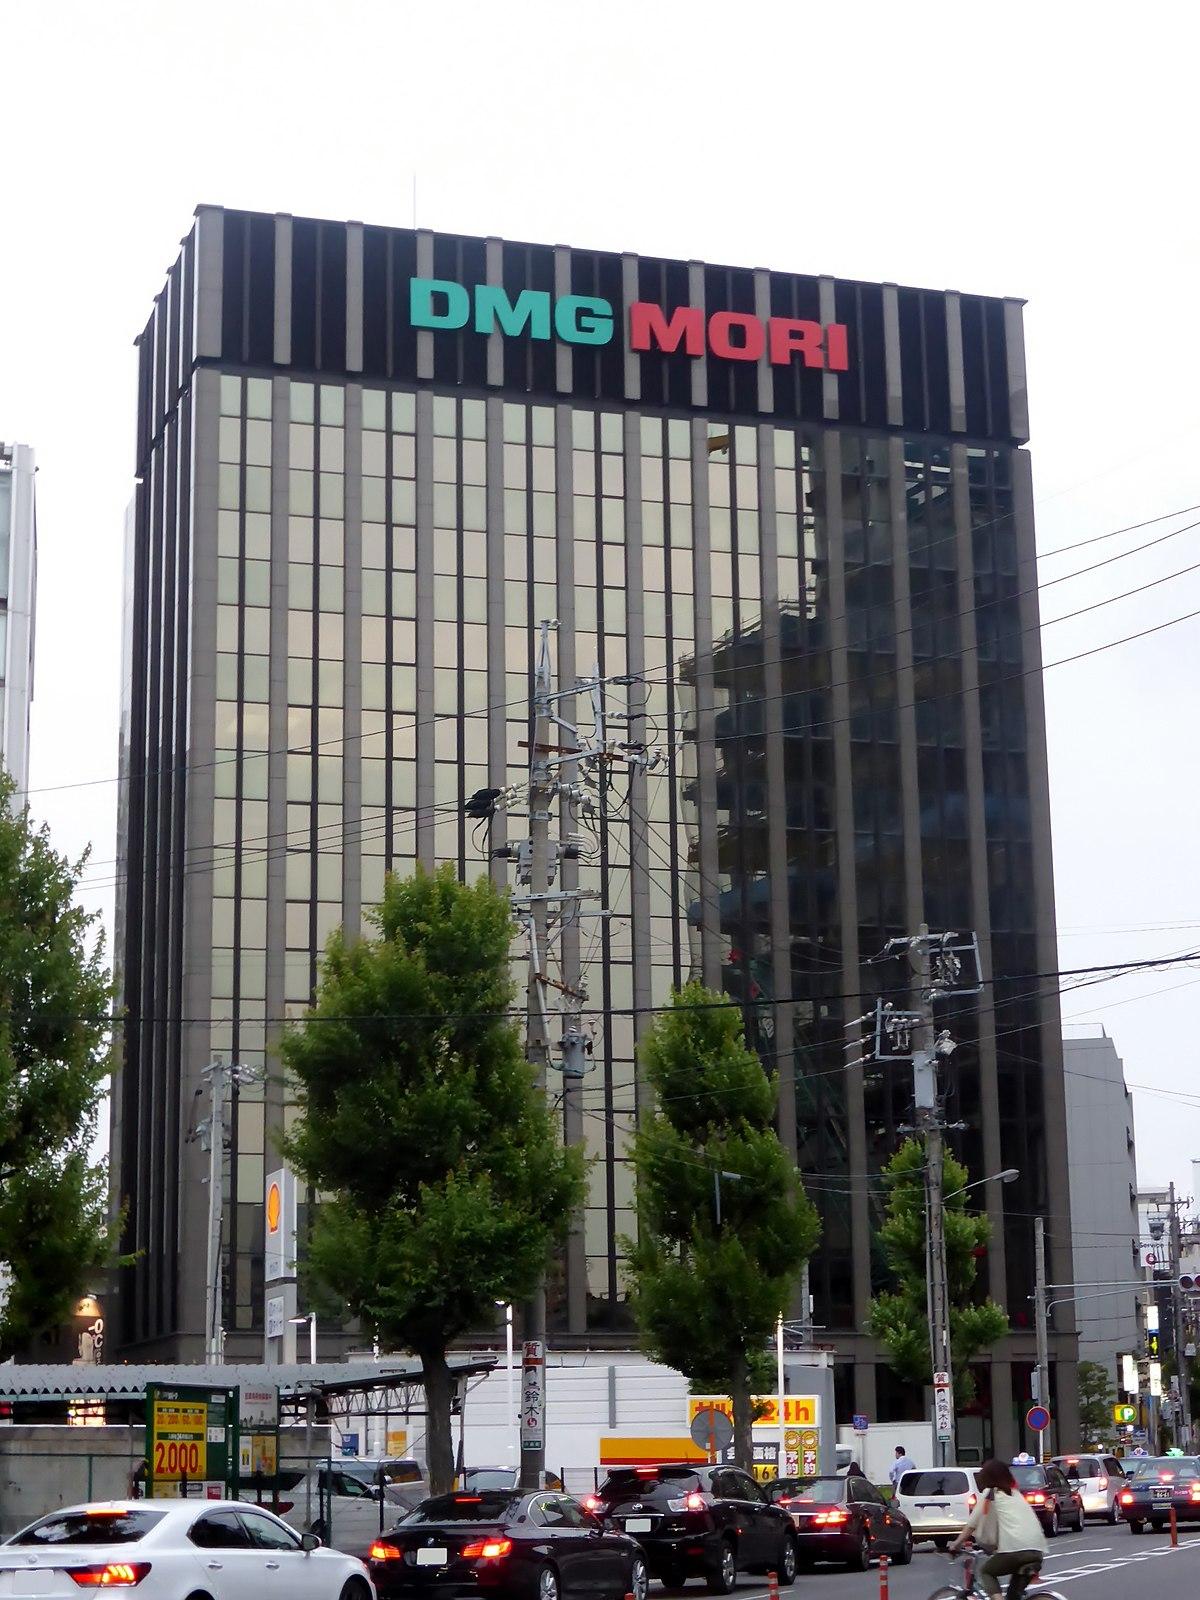 DMG Mori K K  – Wikipedia